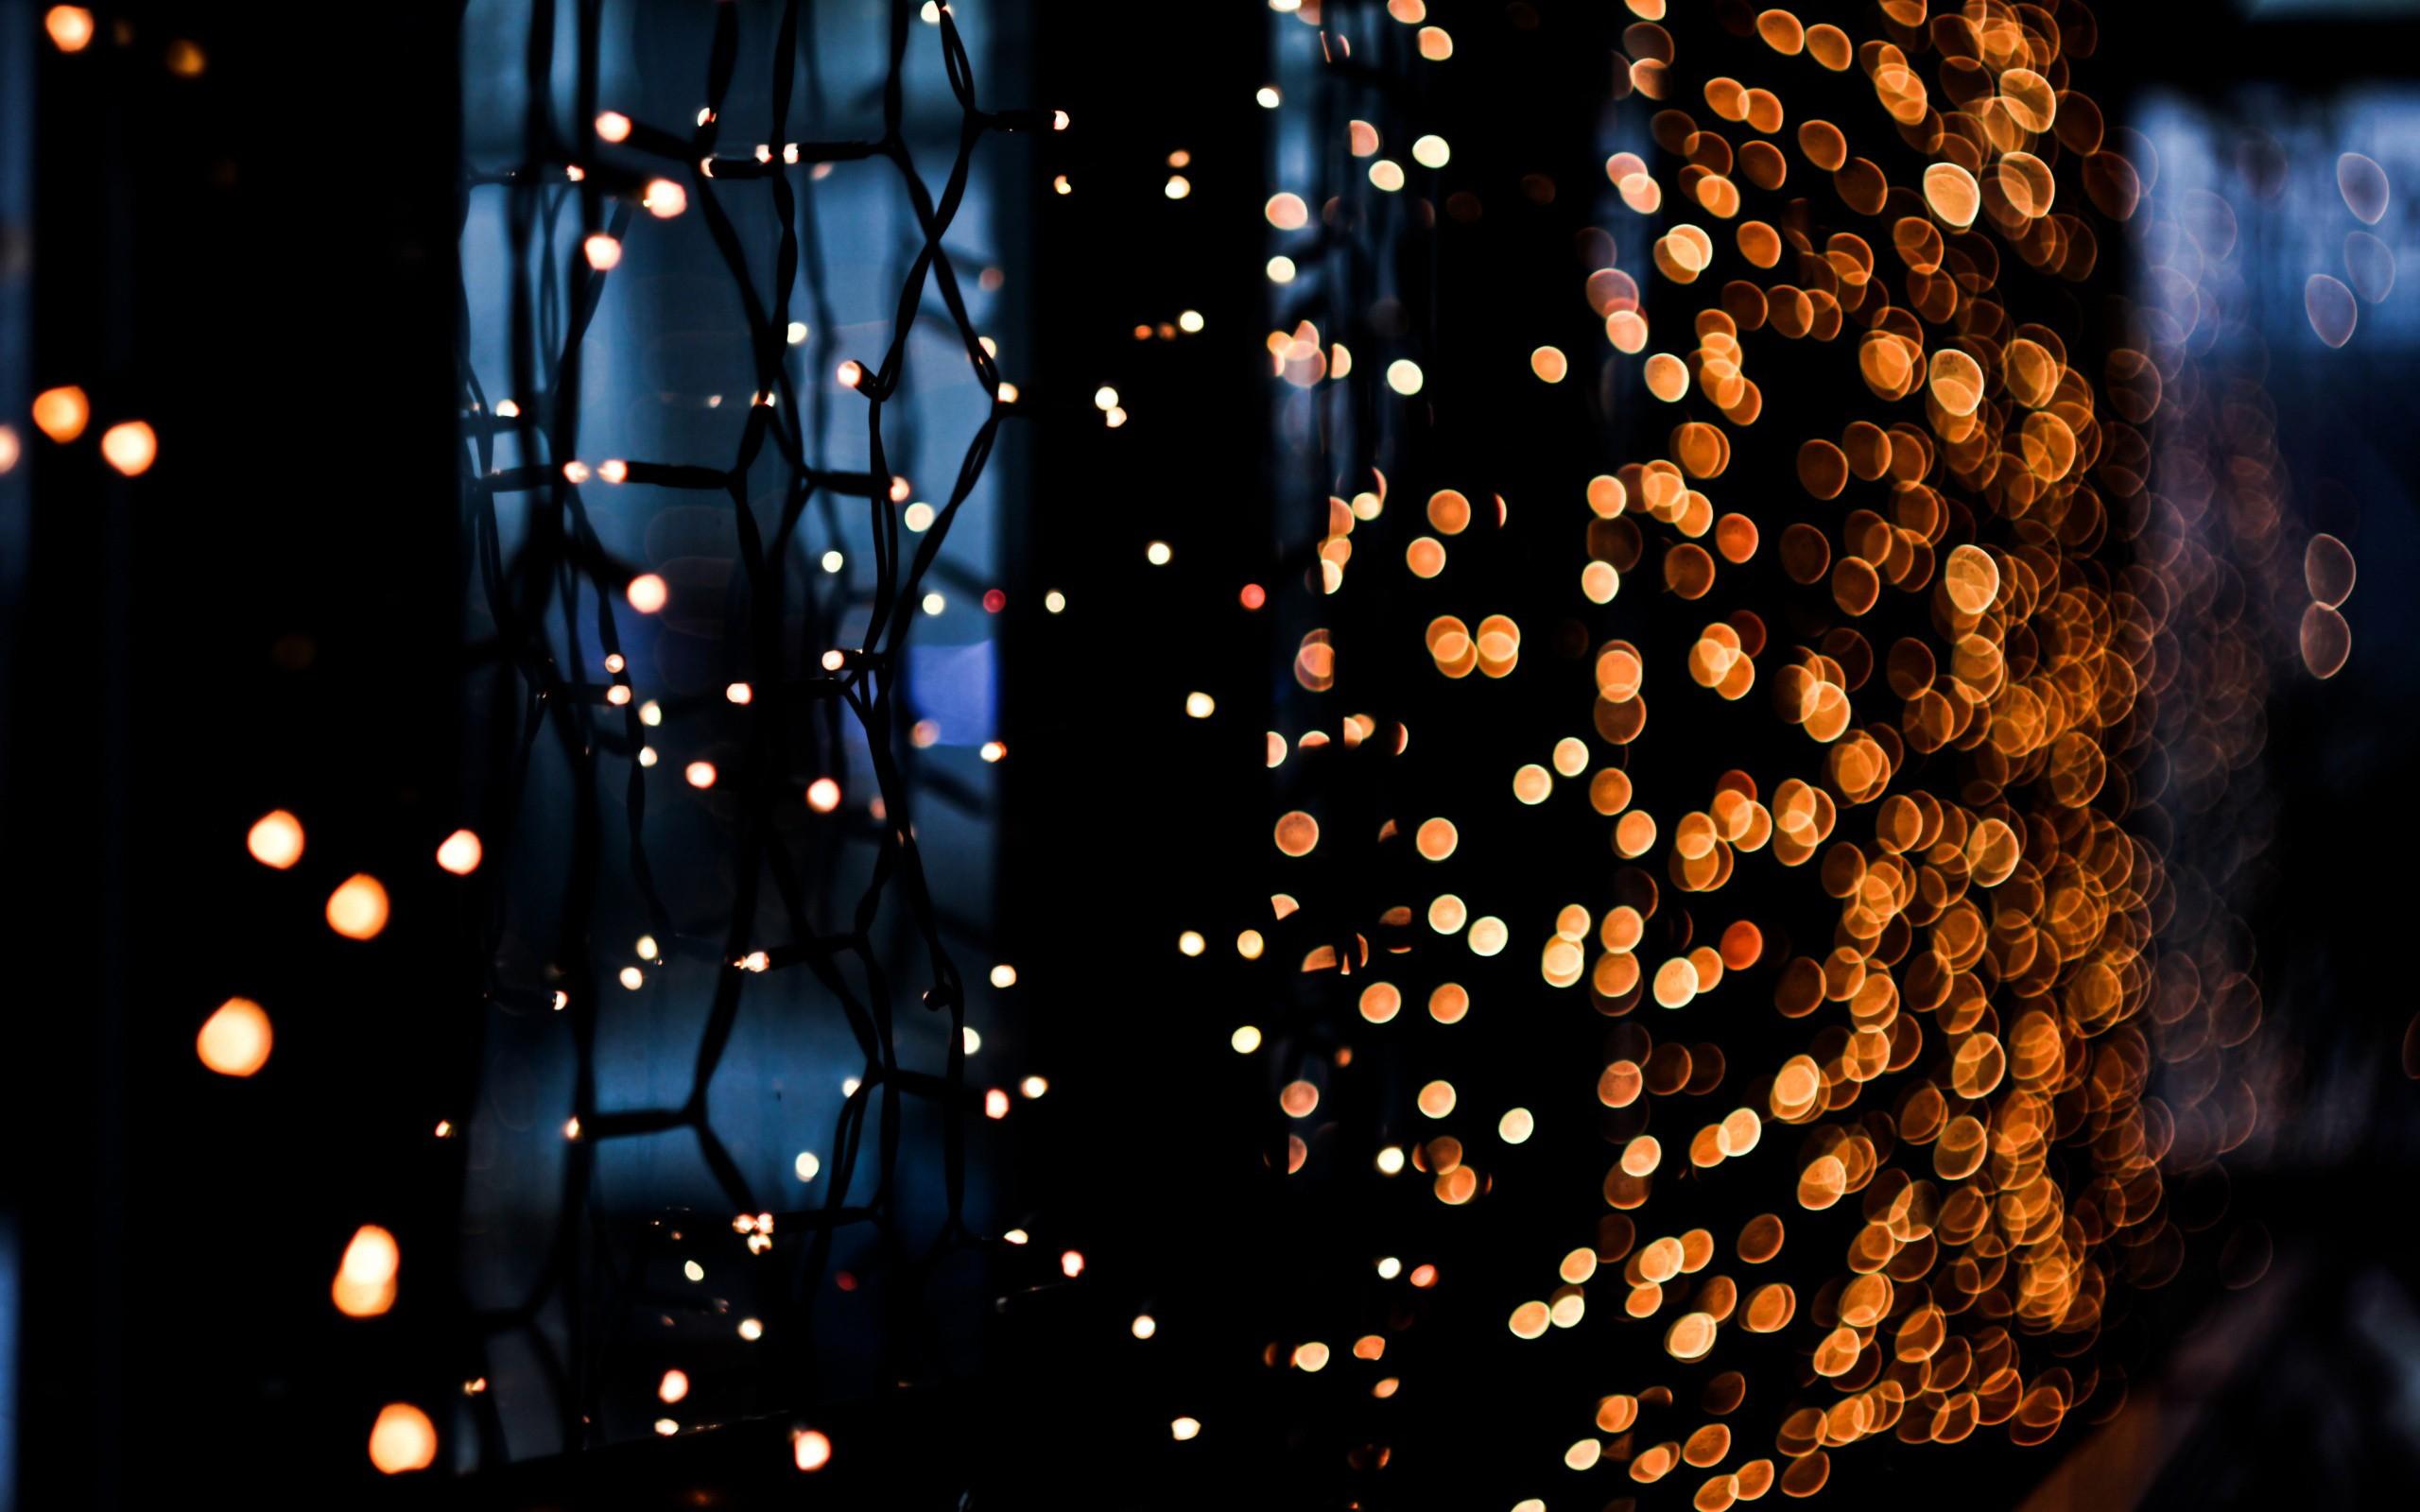 Night lights artistic bokeh wallpaper 2560x1600 10027 wallpaperup - Night light hd wallpaper ...